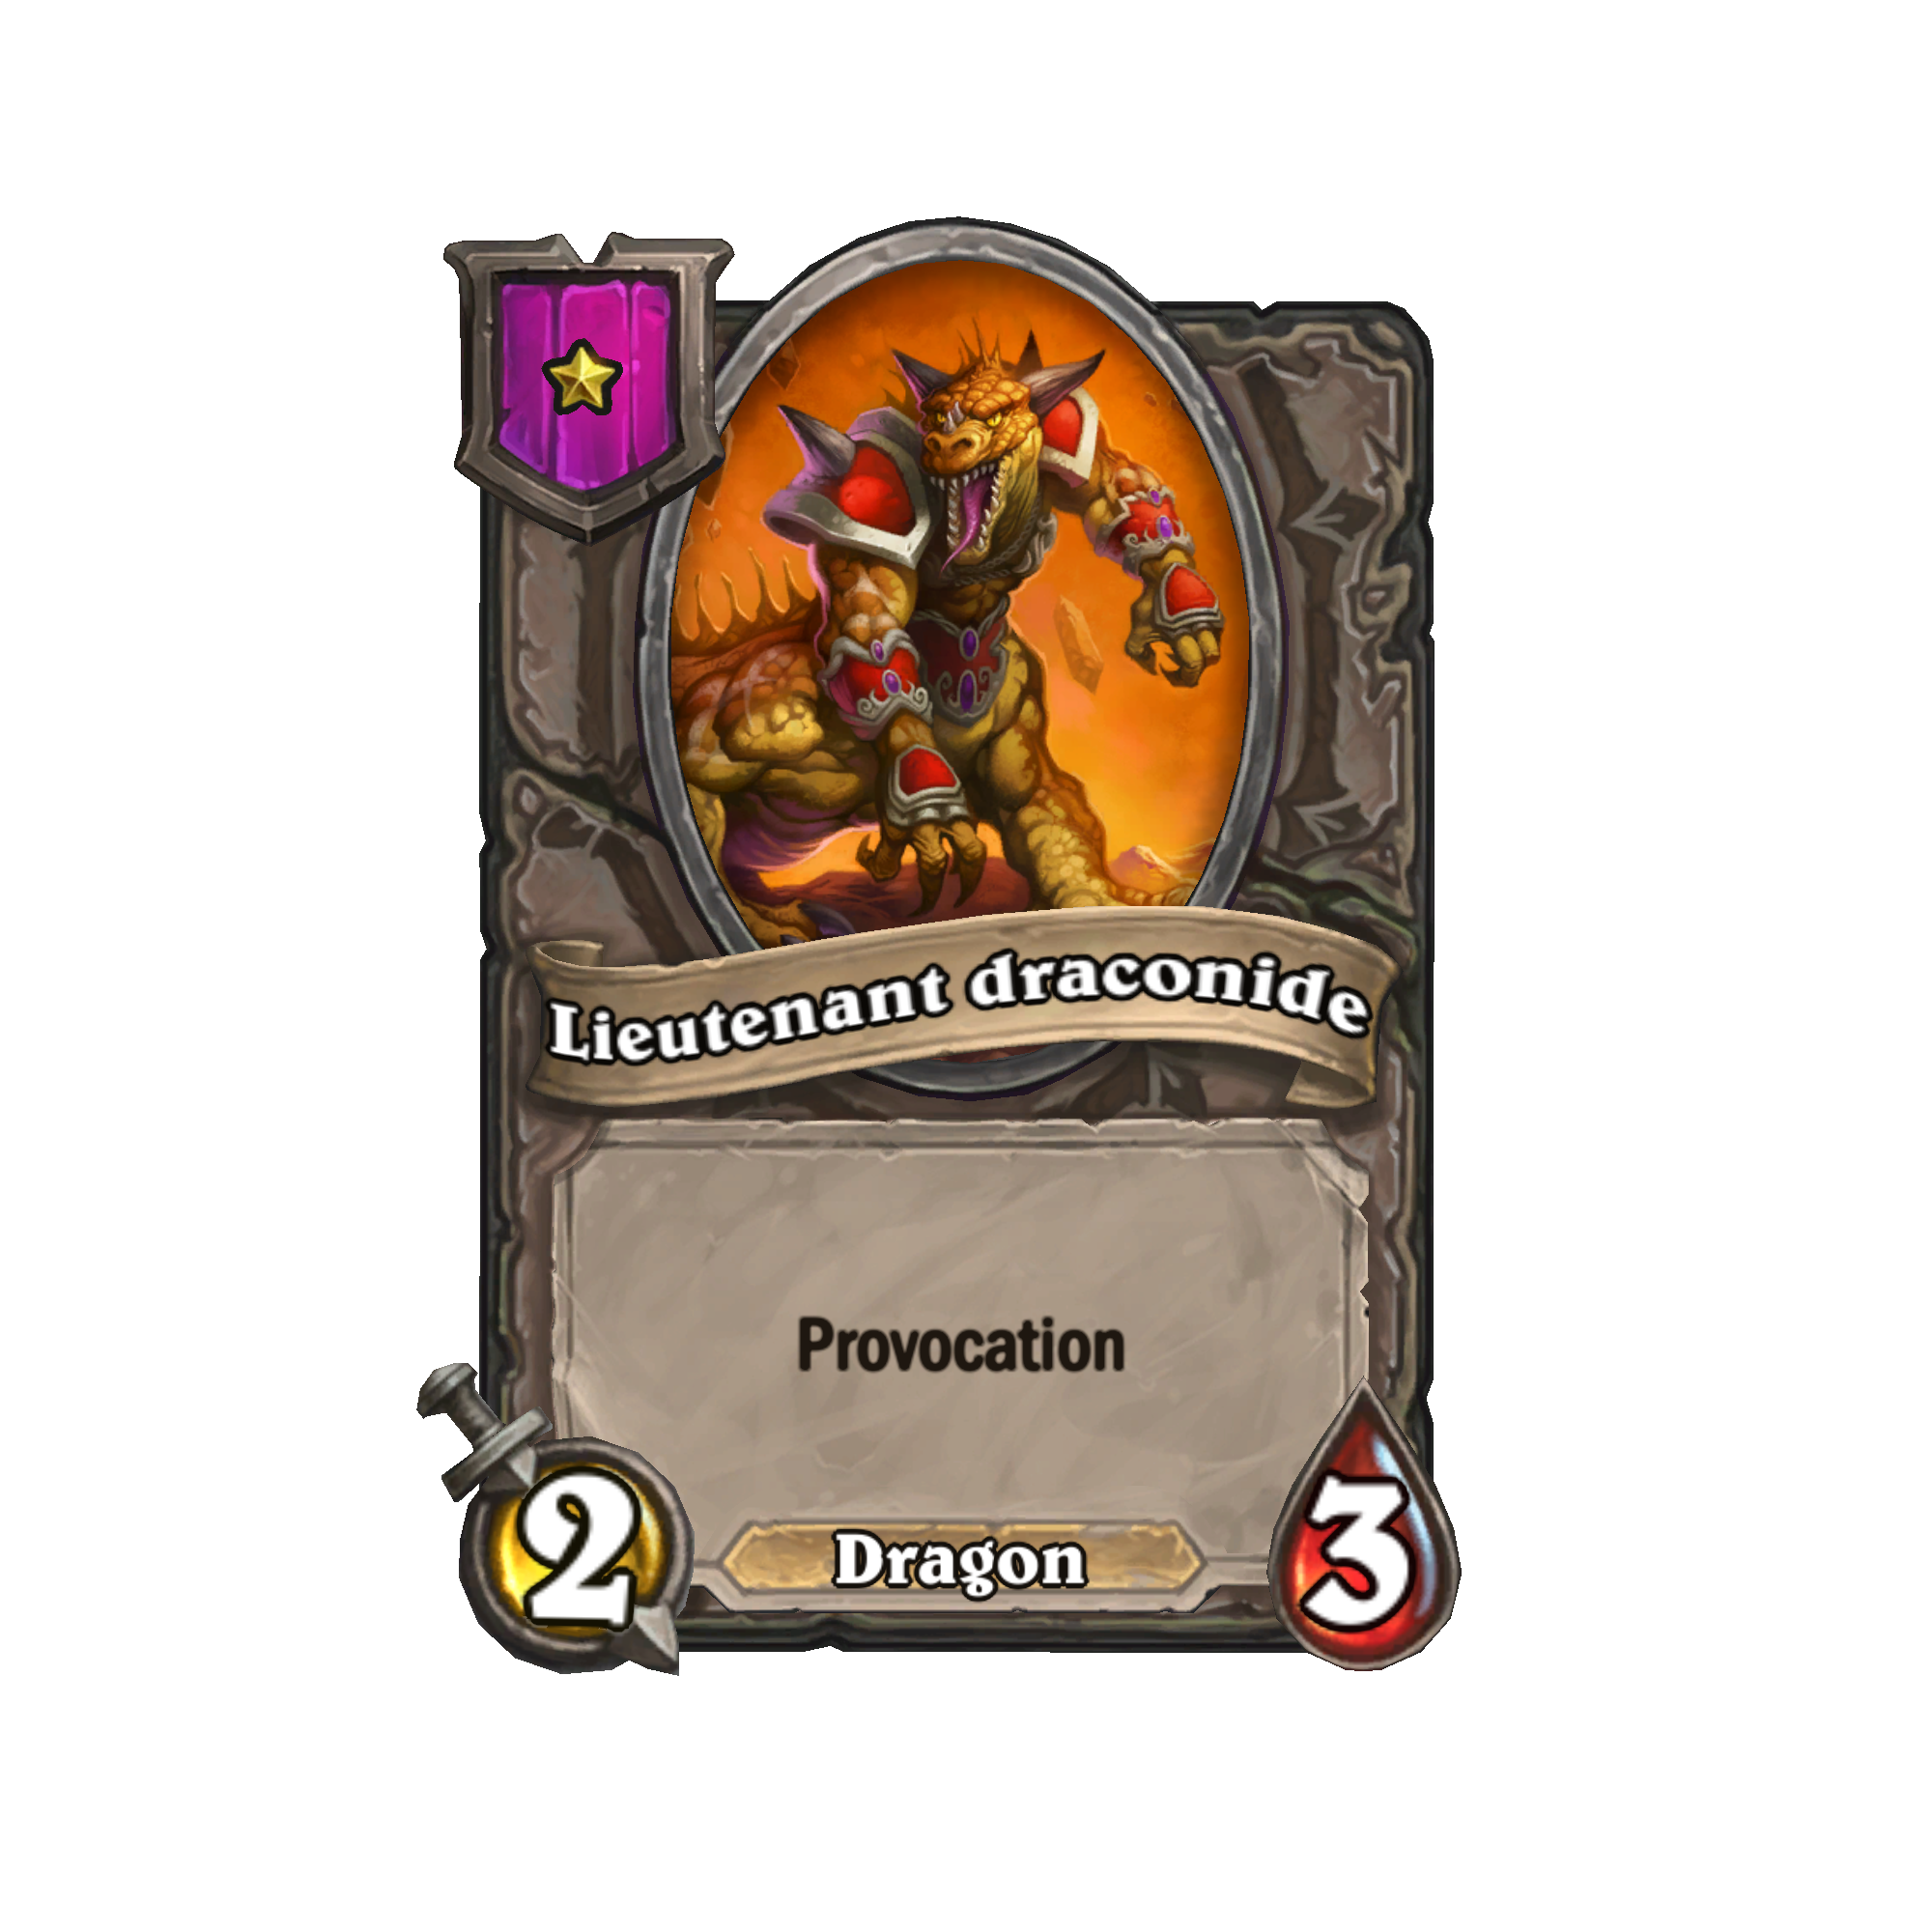 Lieutenant draconide